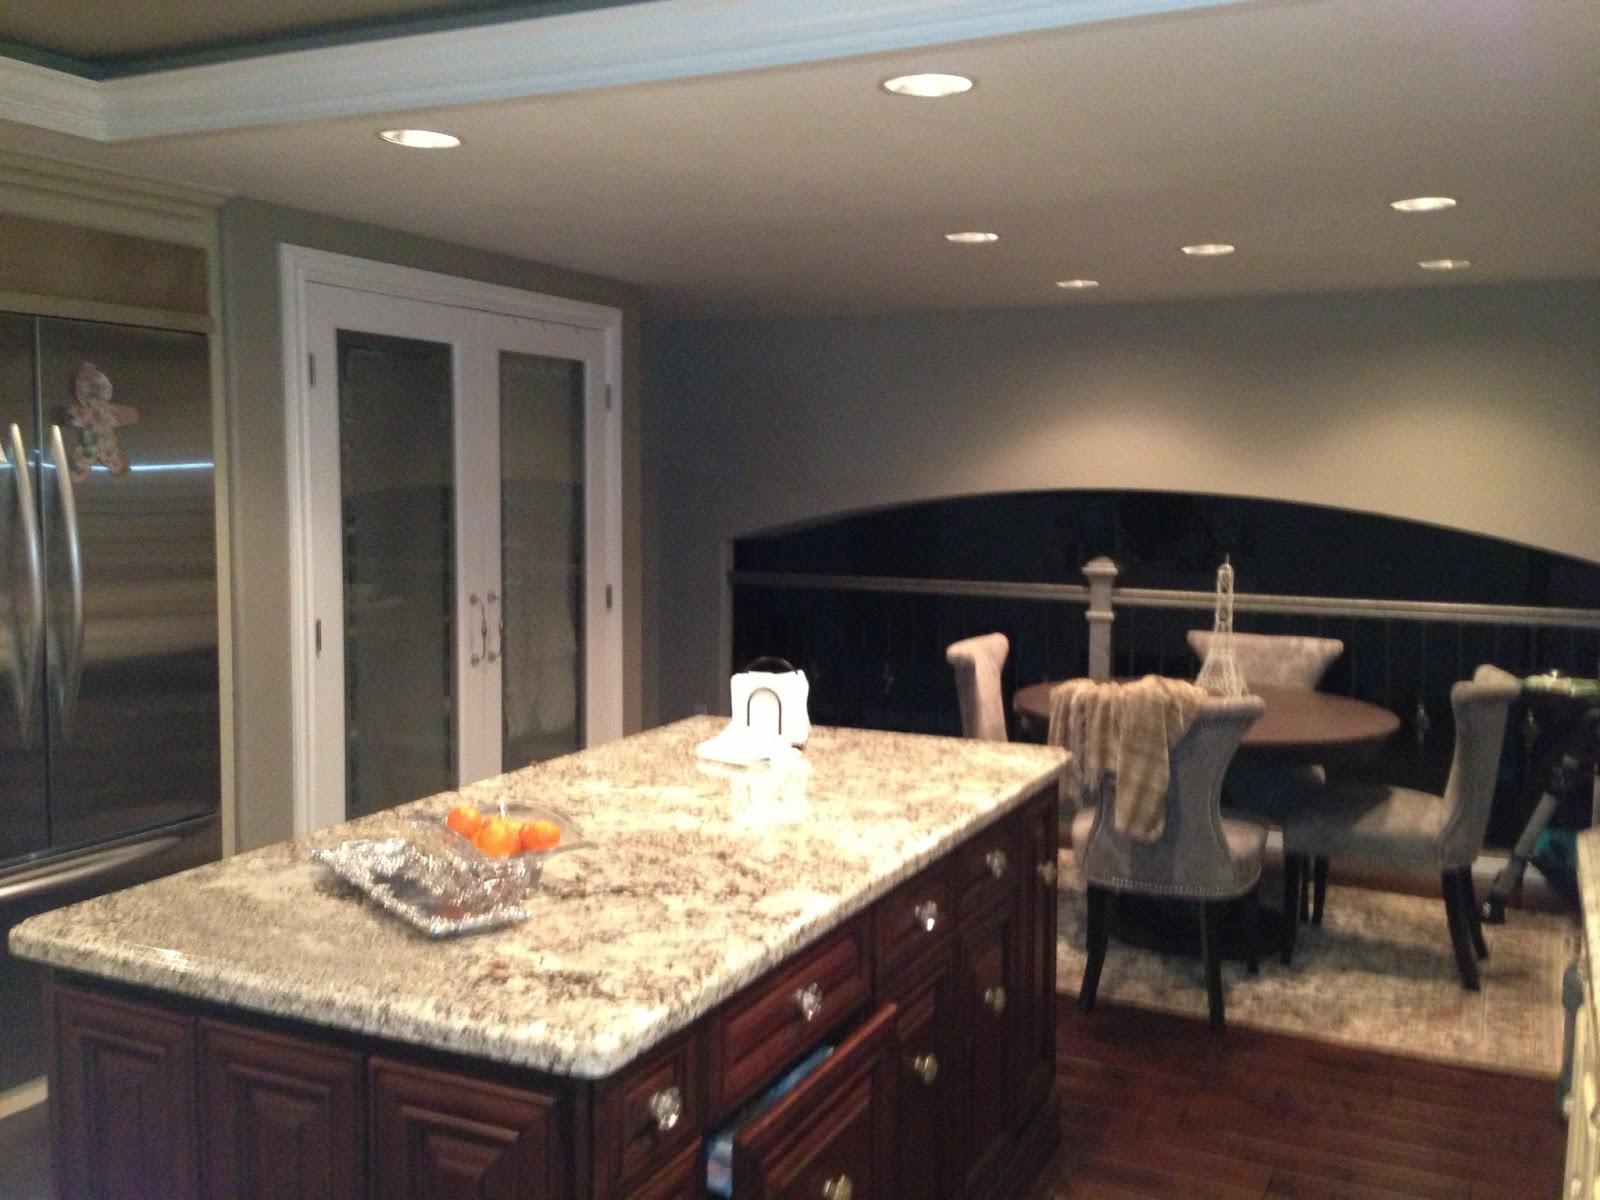 pierce kitchen and bath cabinets pierce kitchen and bath cabinets